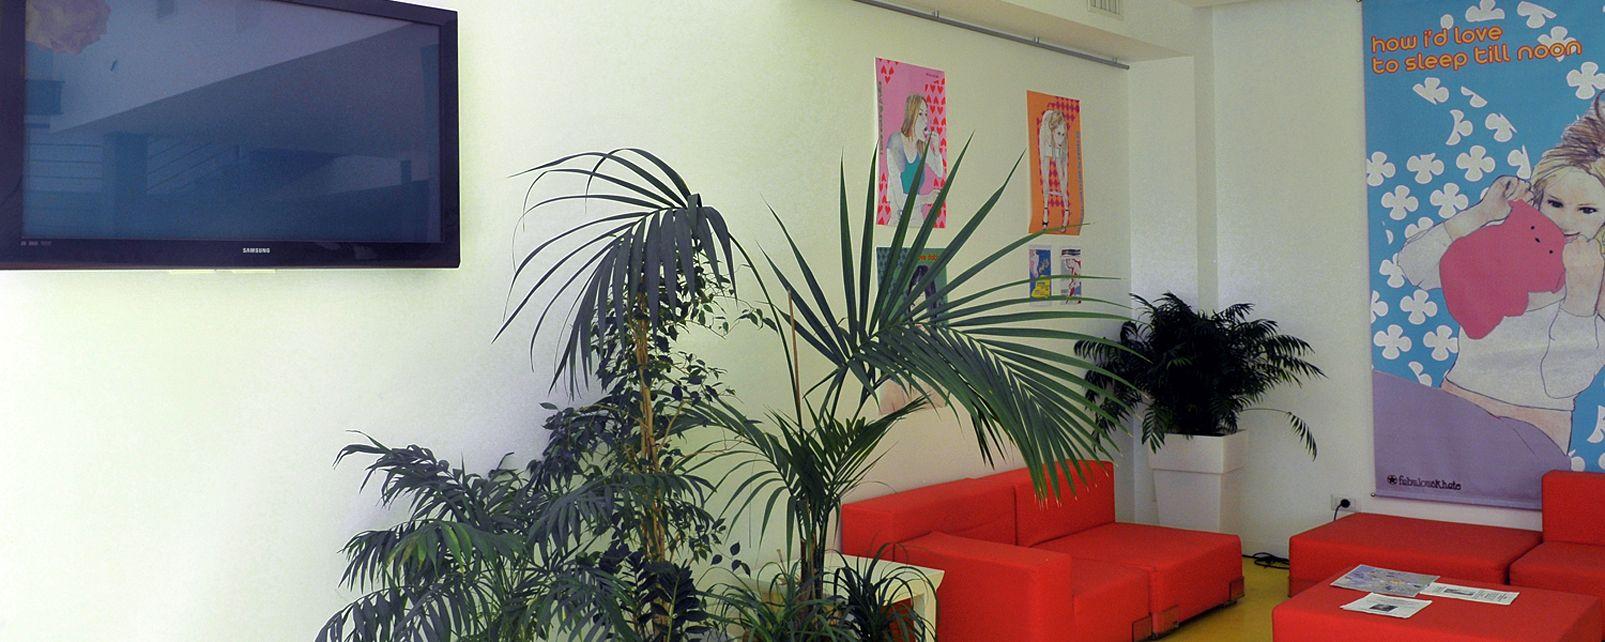 Hôtel Correra 241